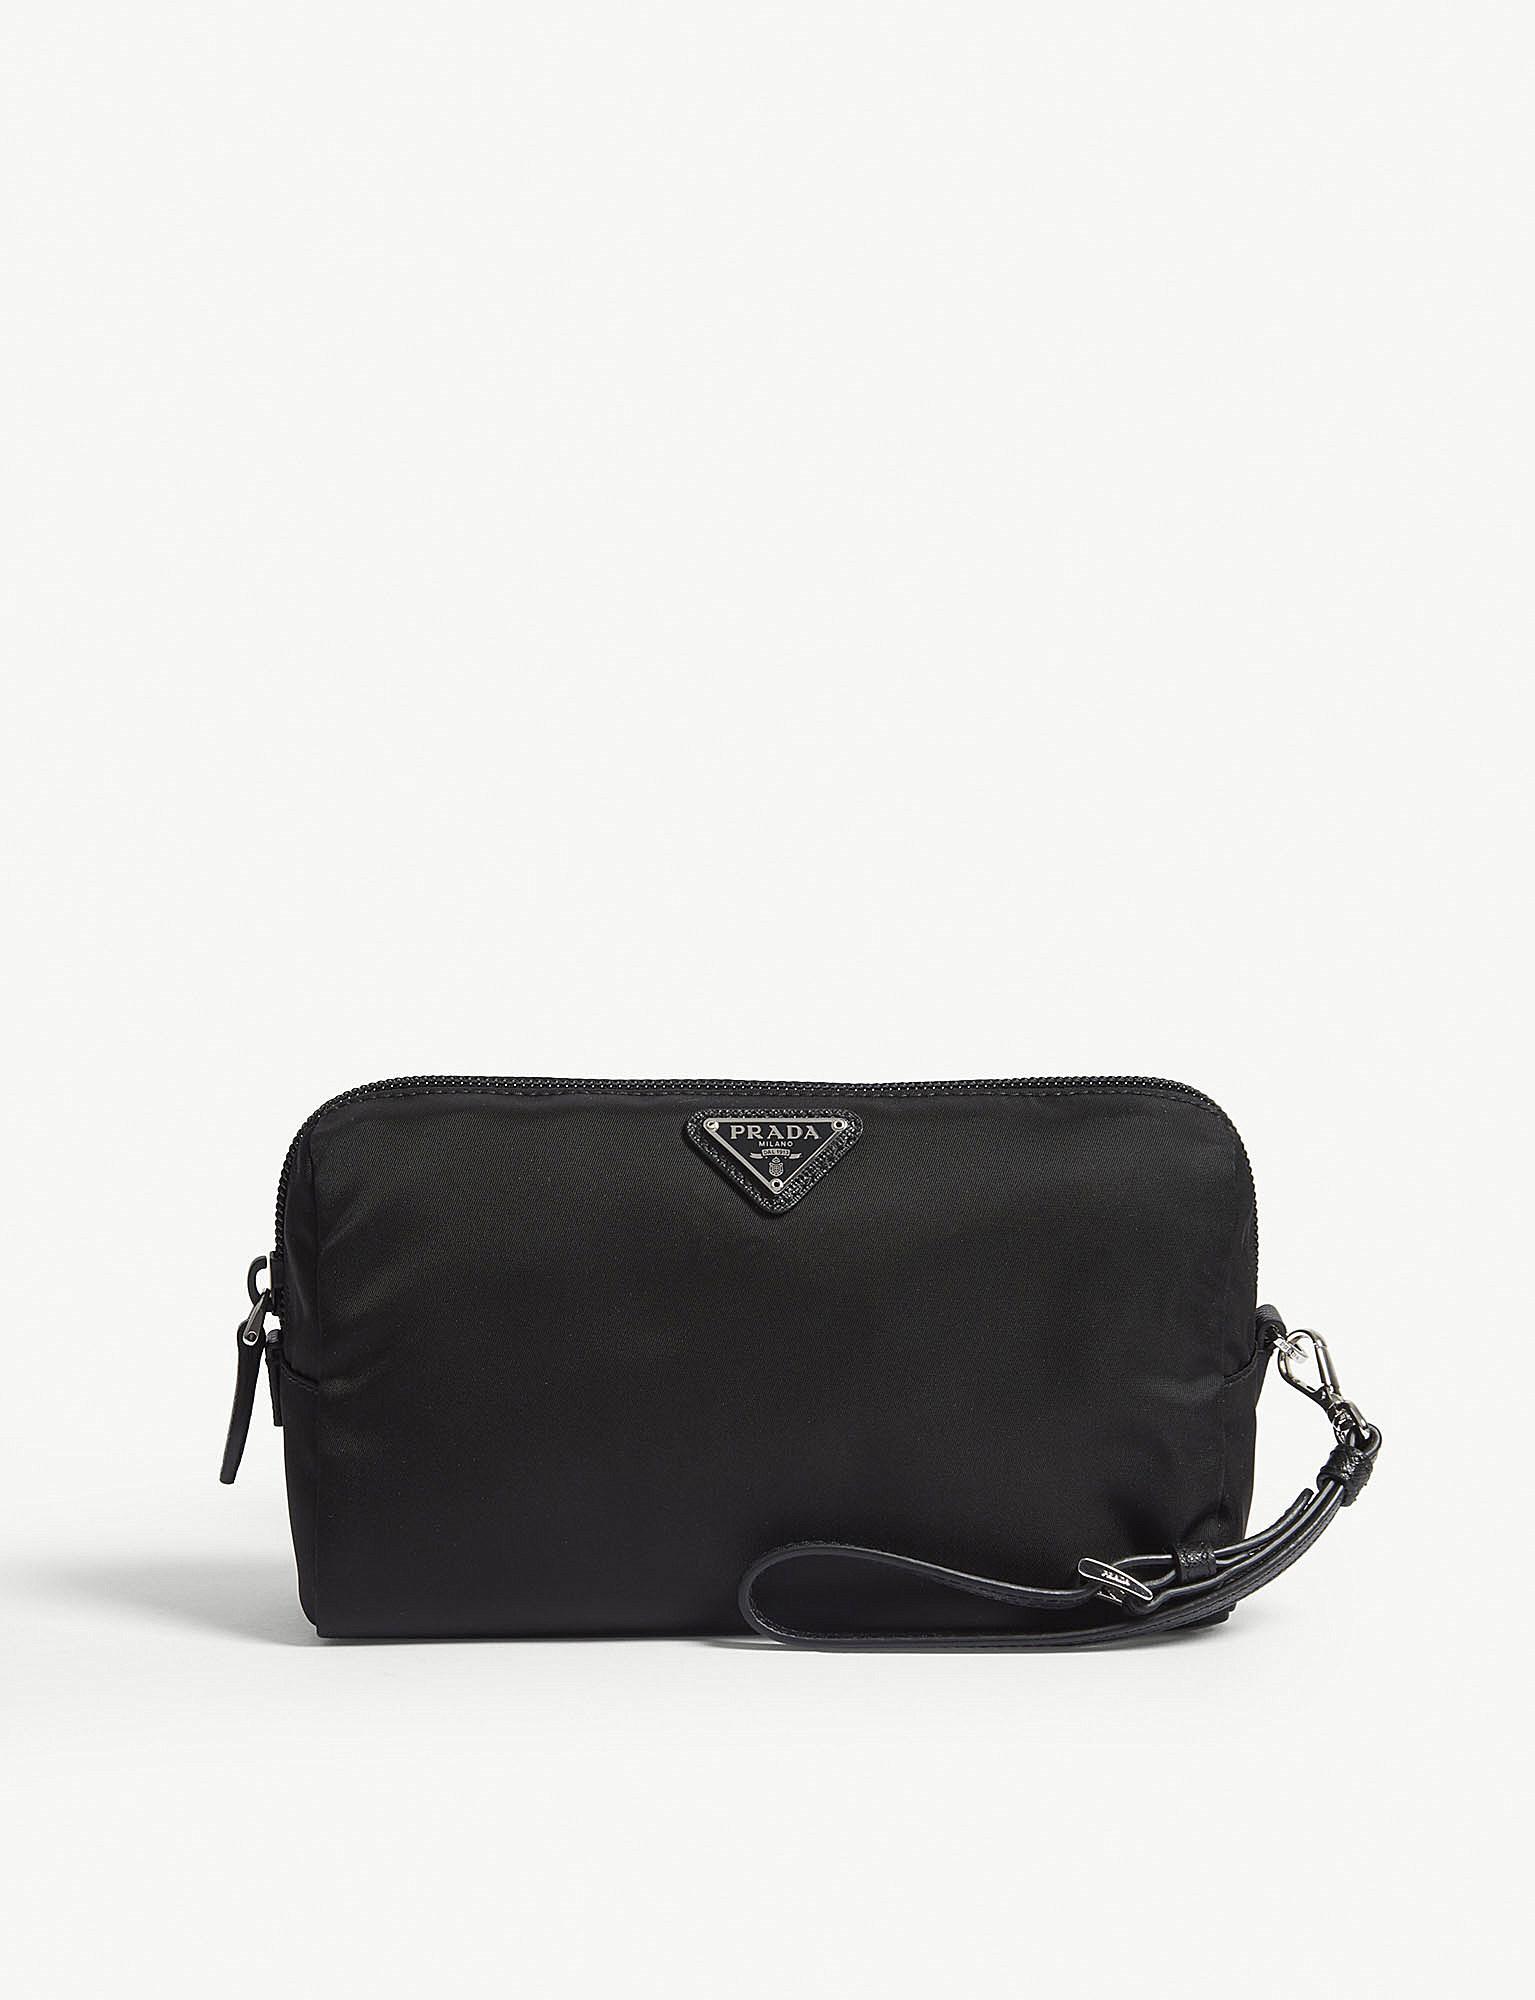 d2f429072c34 Selfridges Prada Handbag - Foto Handbag All Collections Salonagafiya.Com